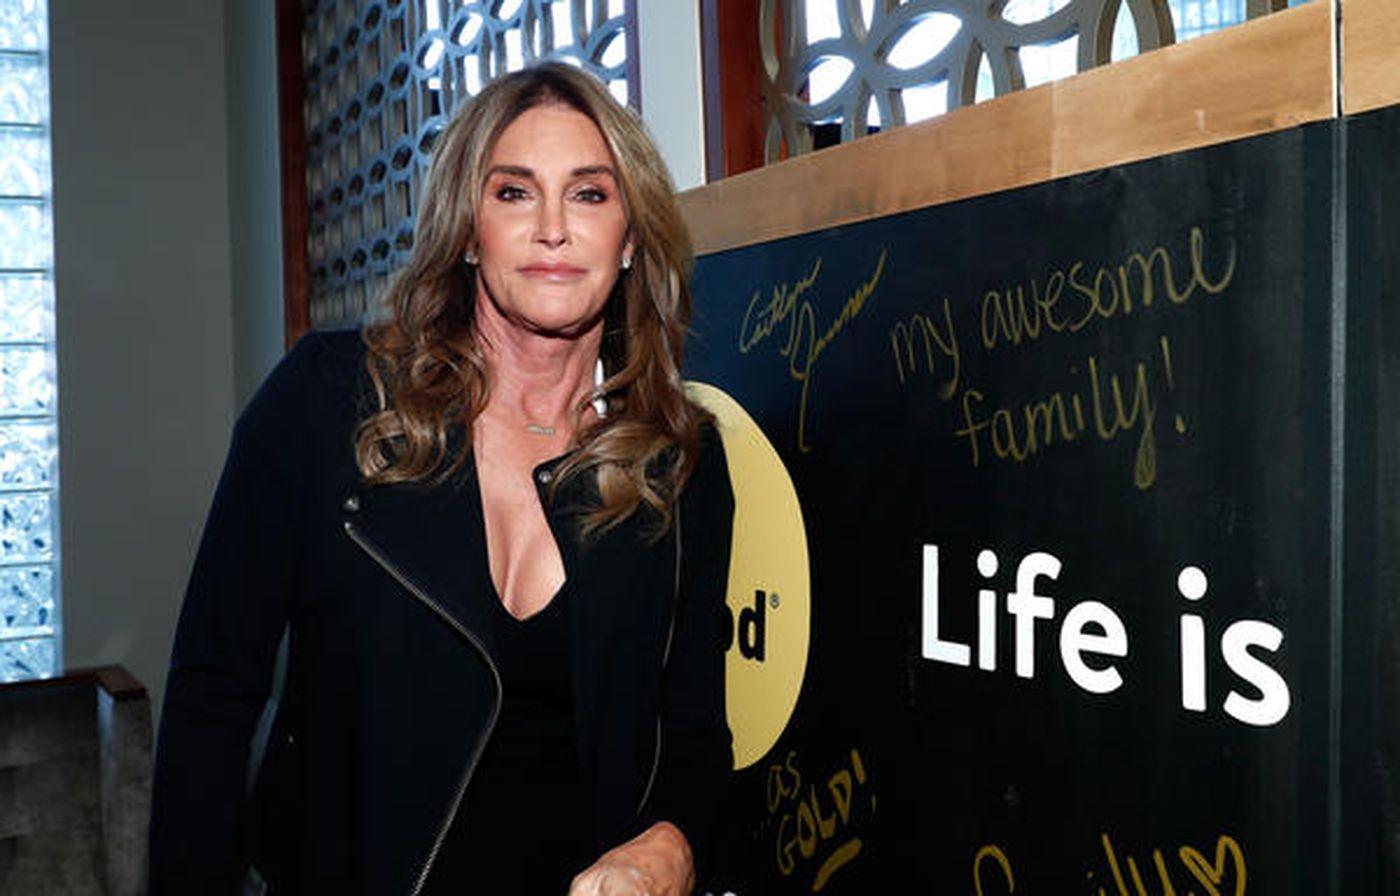 Transgender Activist Caitlyn Jenner, Ends Support For President Trump